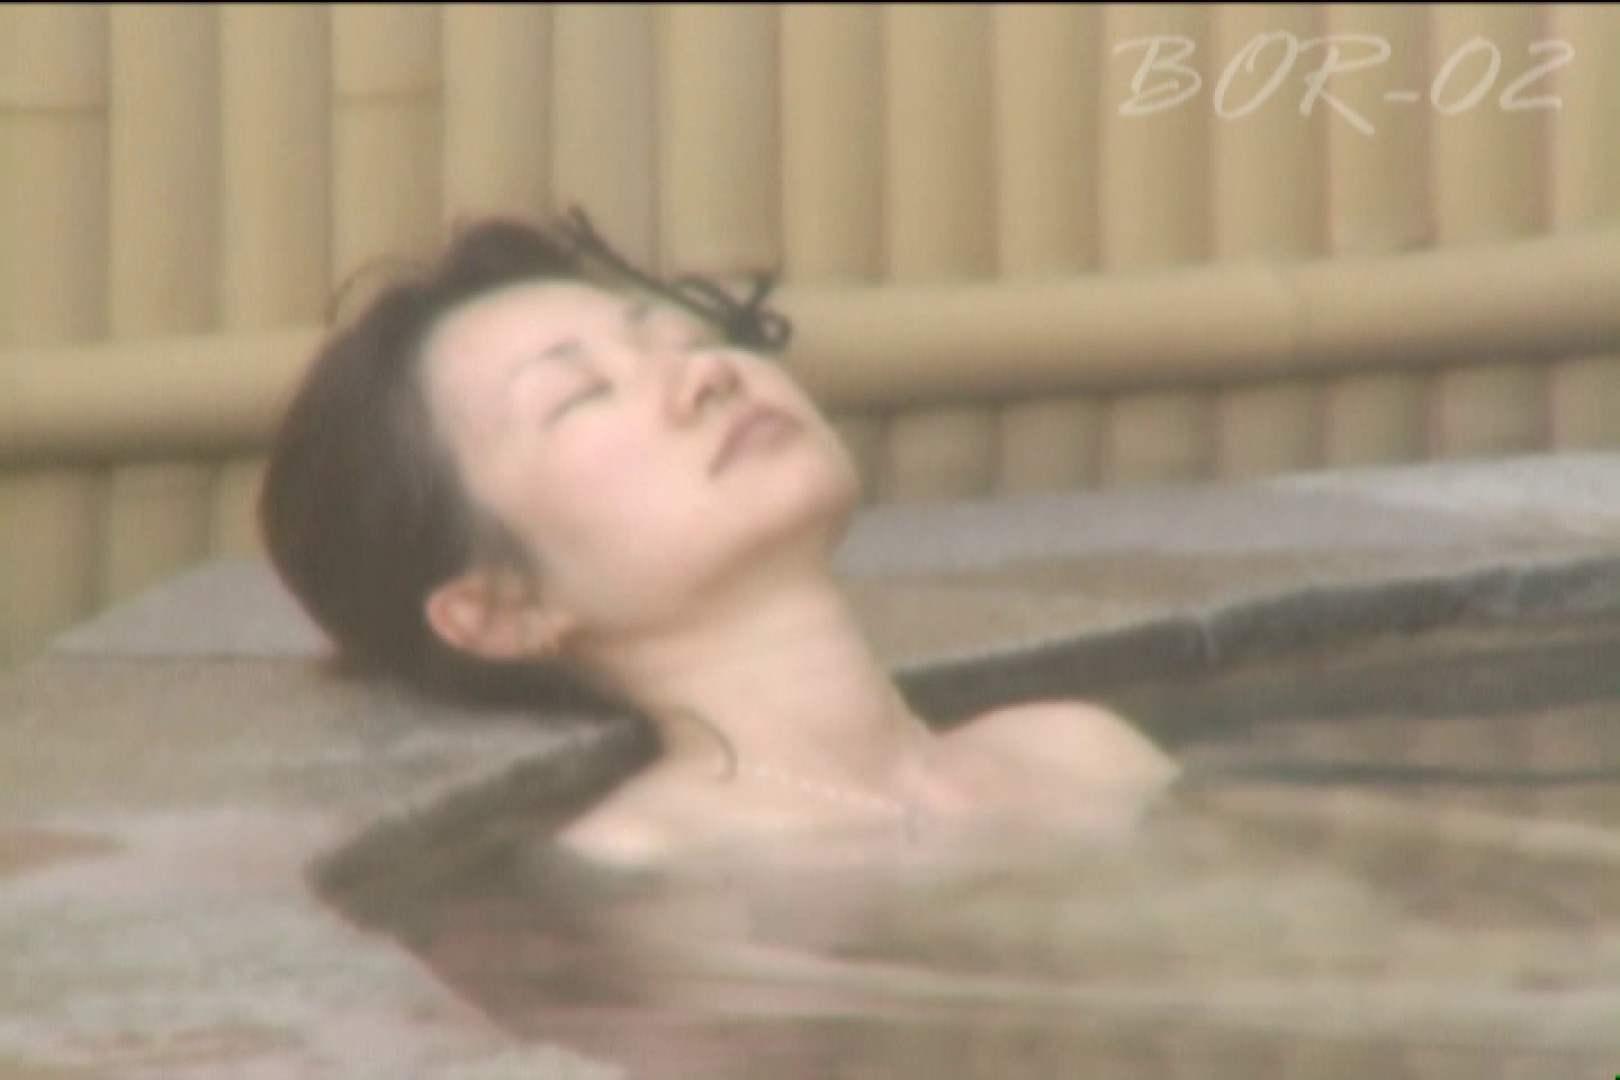 Aquaな露天風呂Vol.477 盗撮   OLエロ画像  99PICs 58